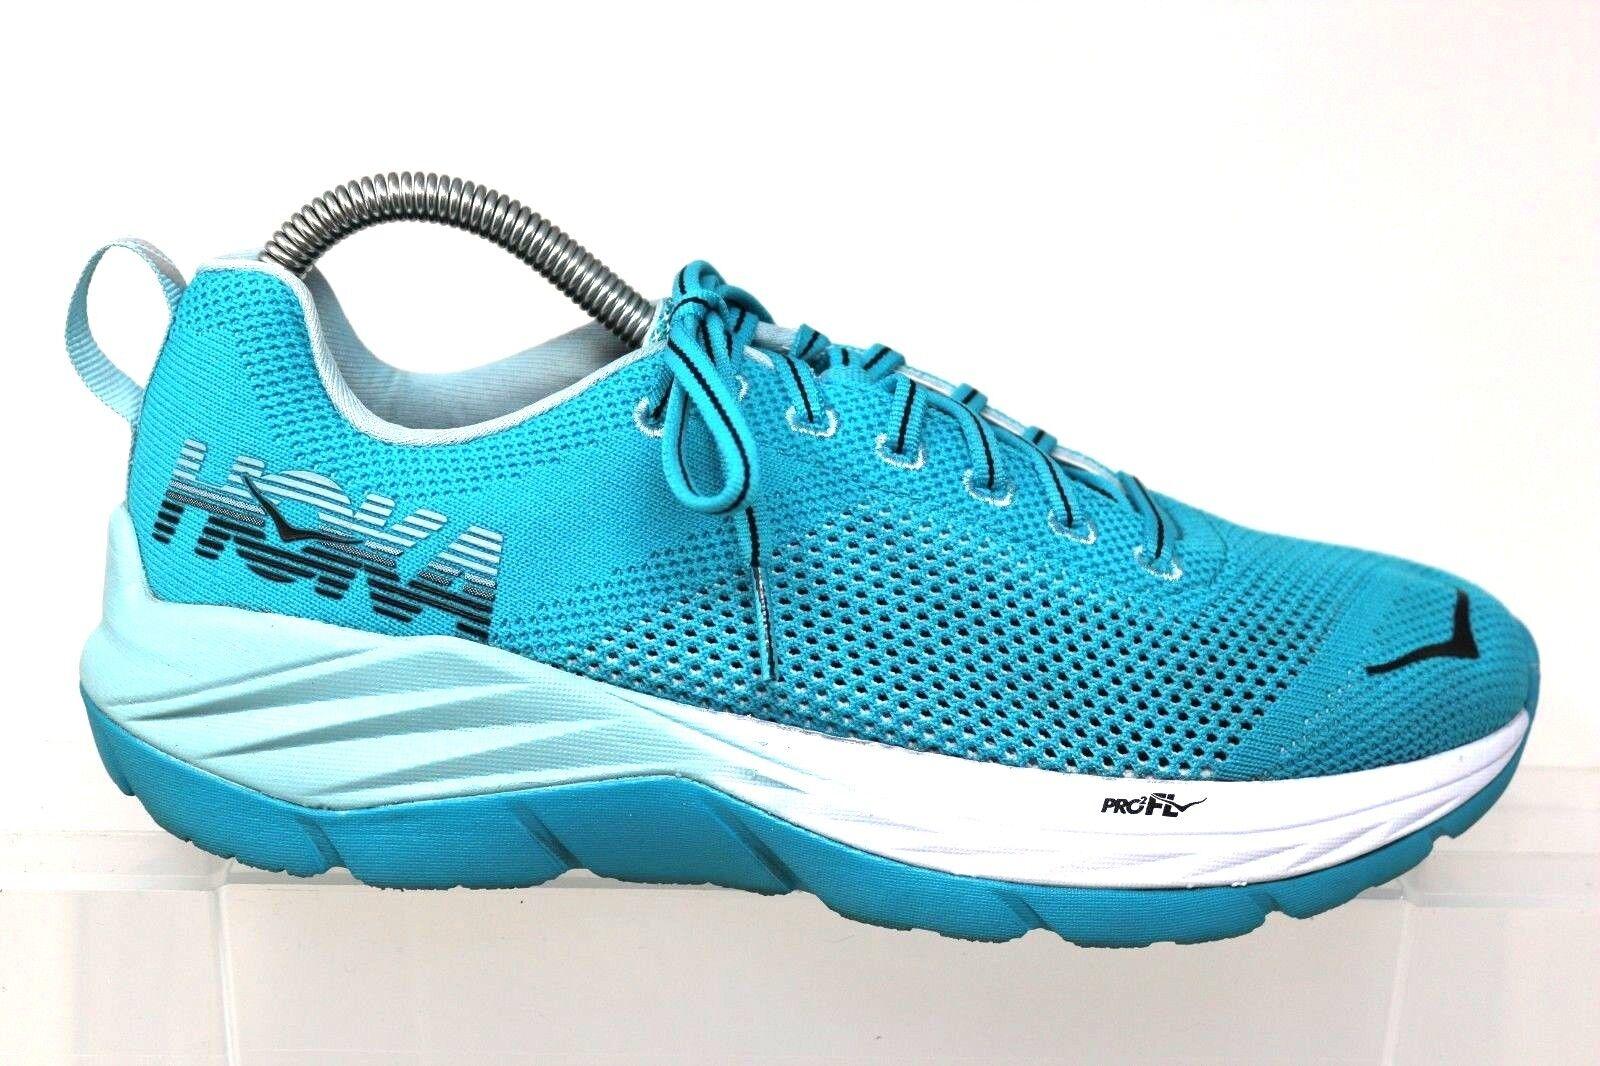 Hoka One One One One Mach azulbird blancoo Neutro Zapatillas para mujer Talla 8.5  Felices compras